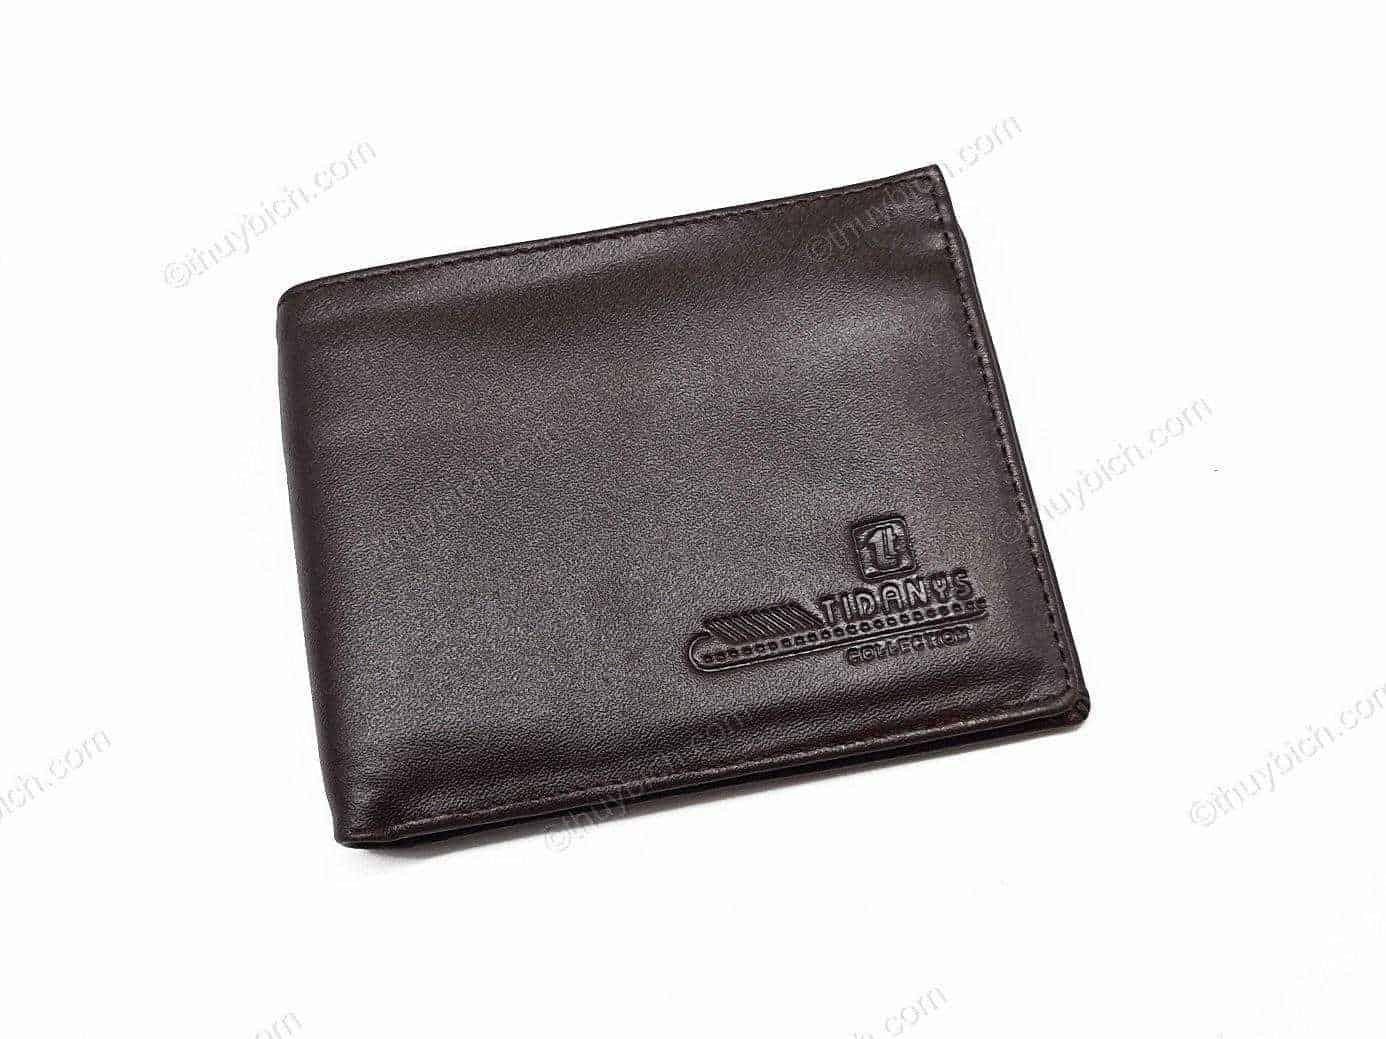 Bóp da nam BNGR-P608